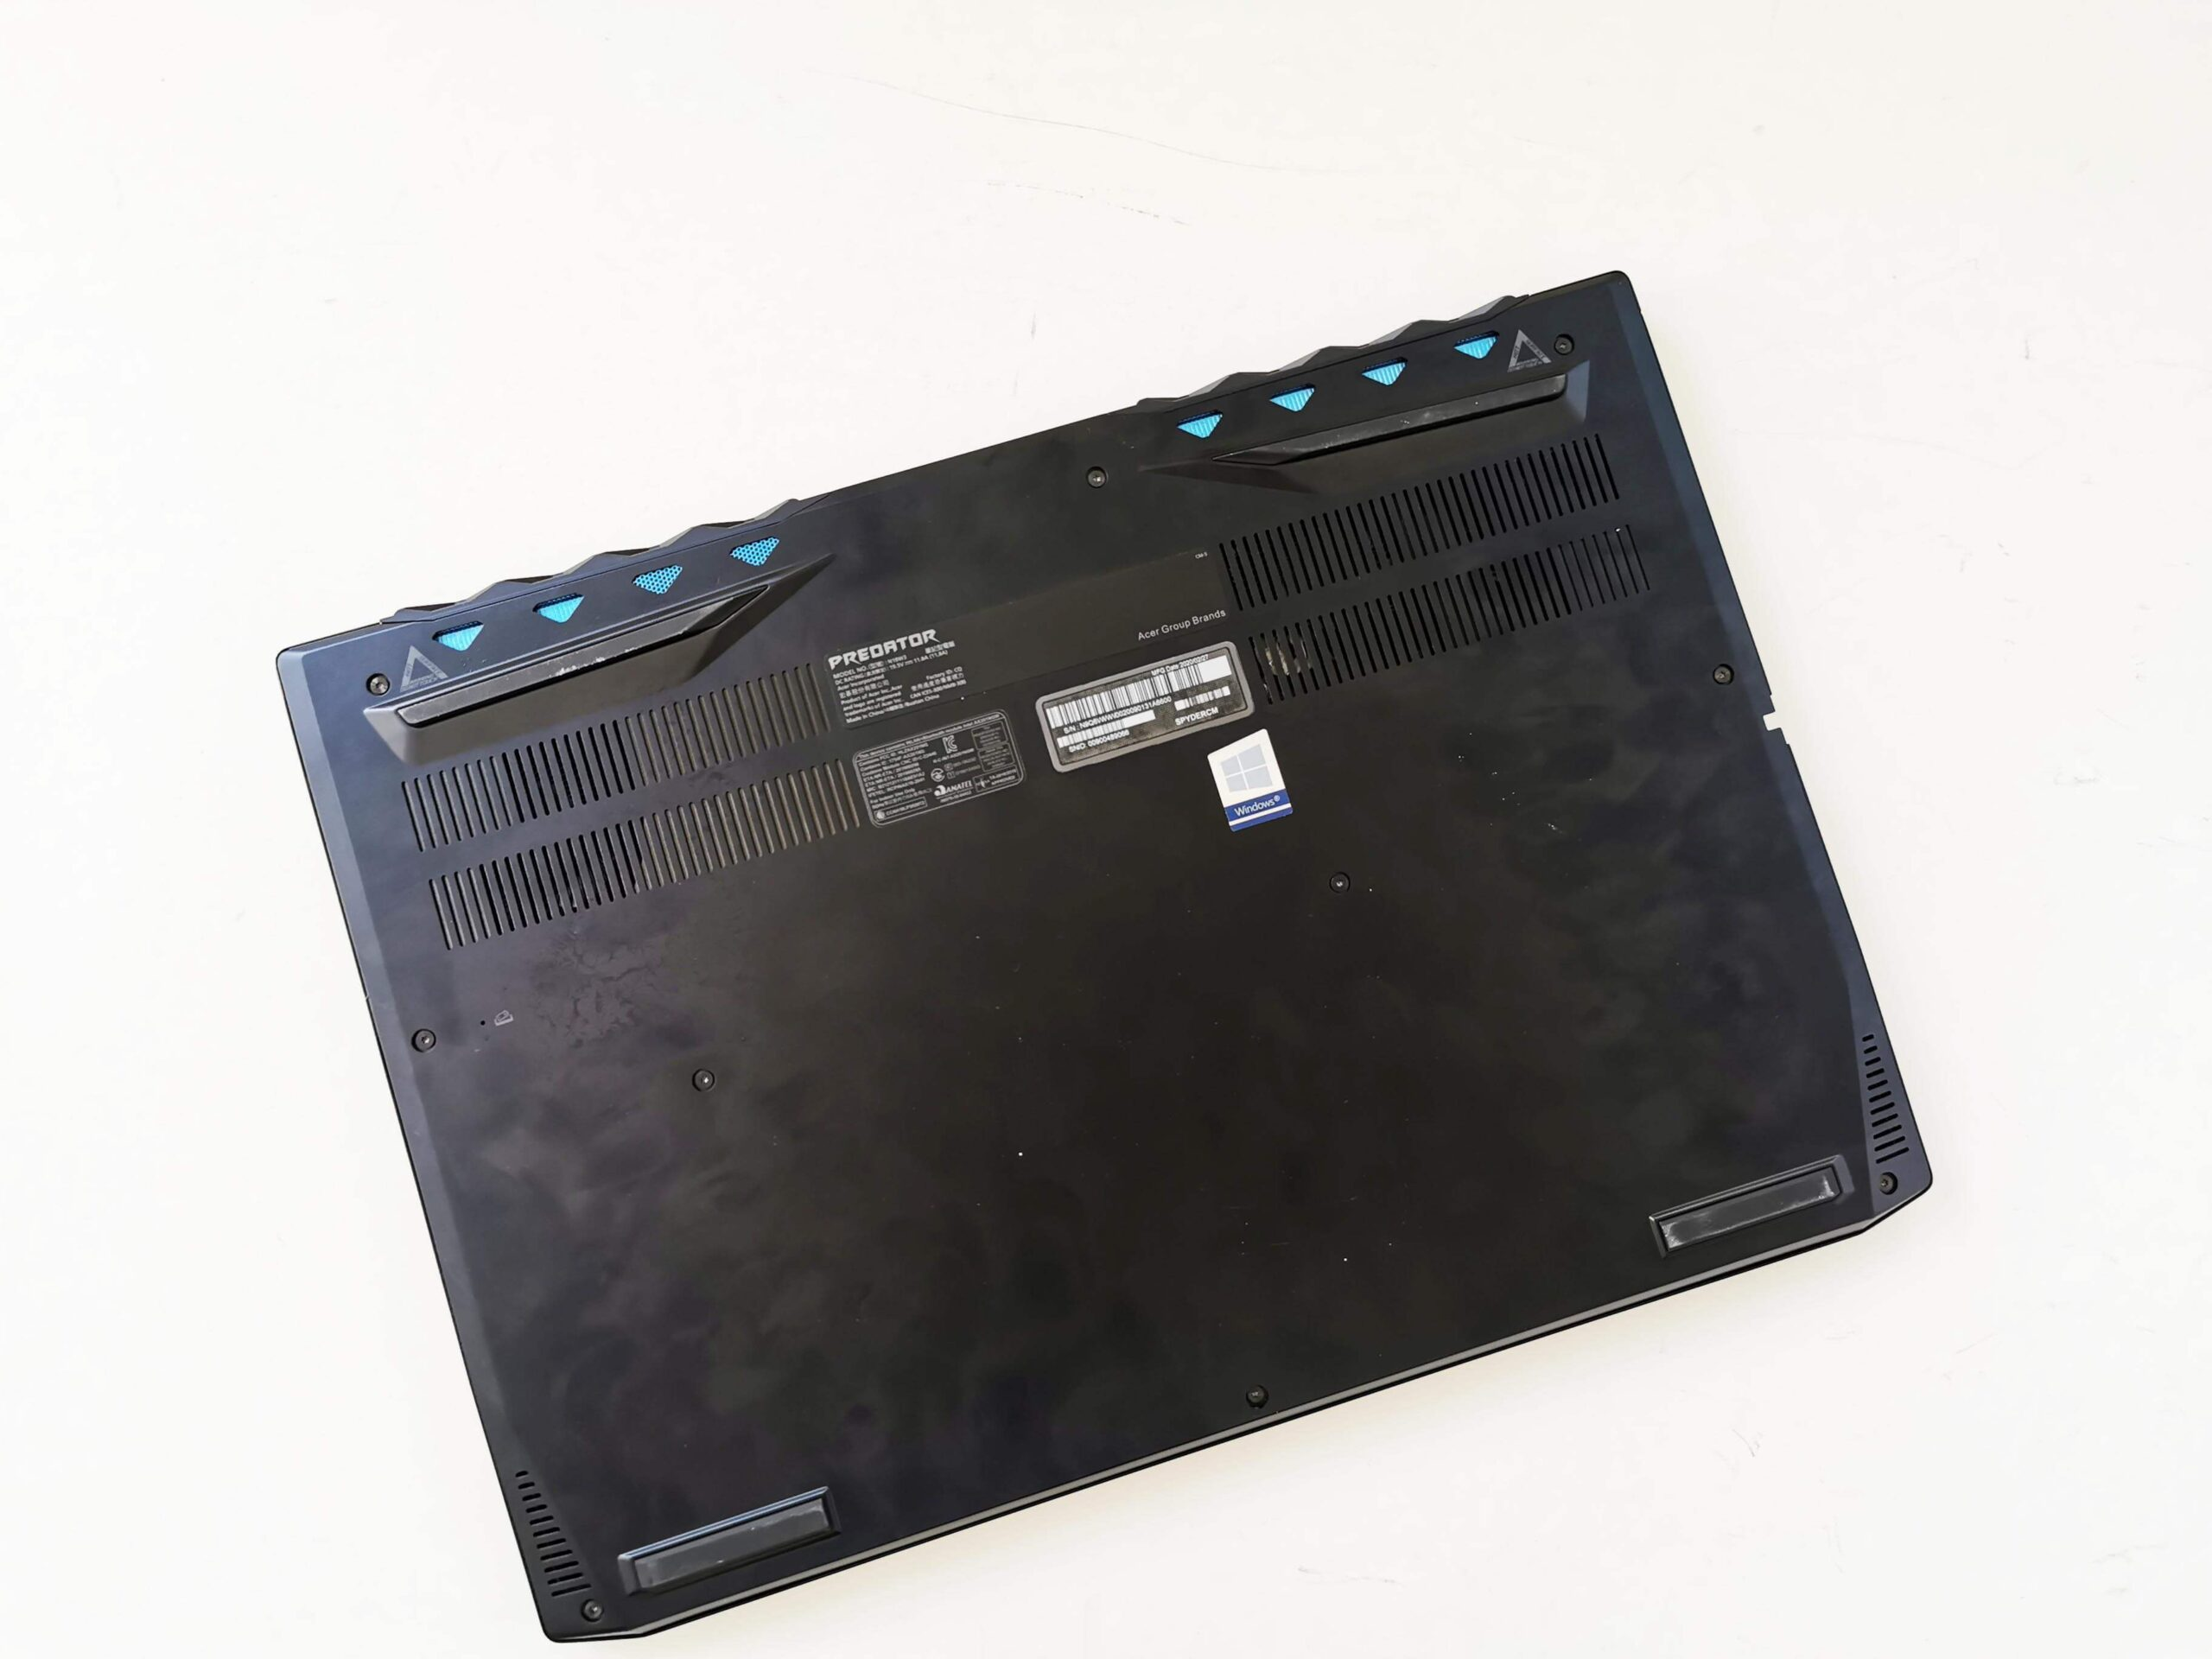 Acer Predator Triton 500 Review Romana si Pareri - 1